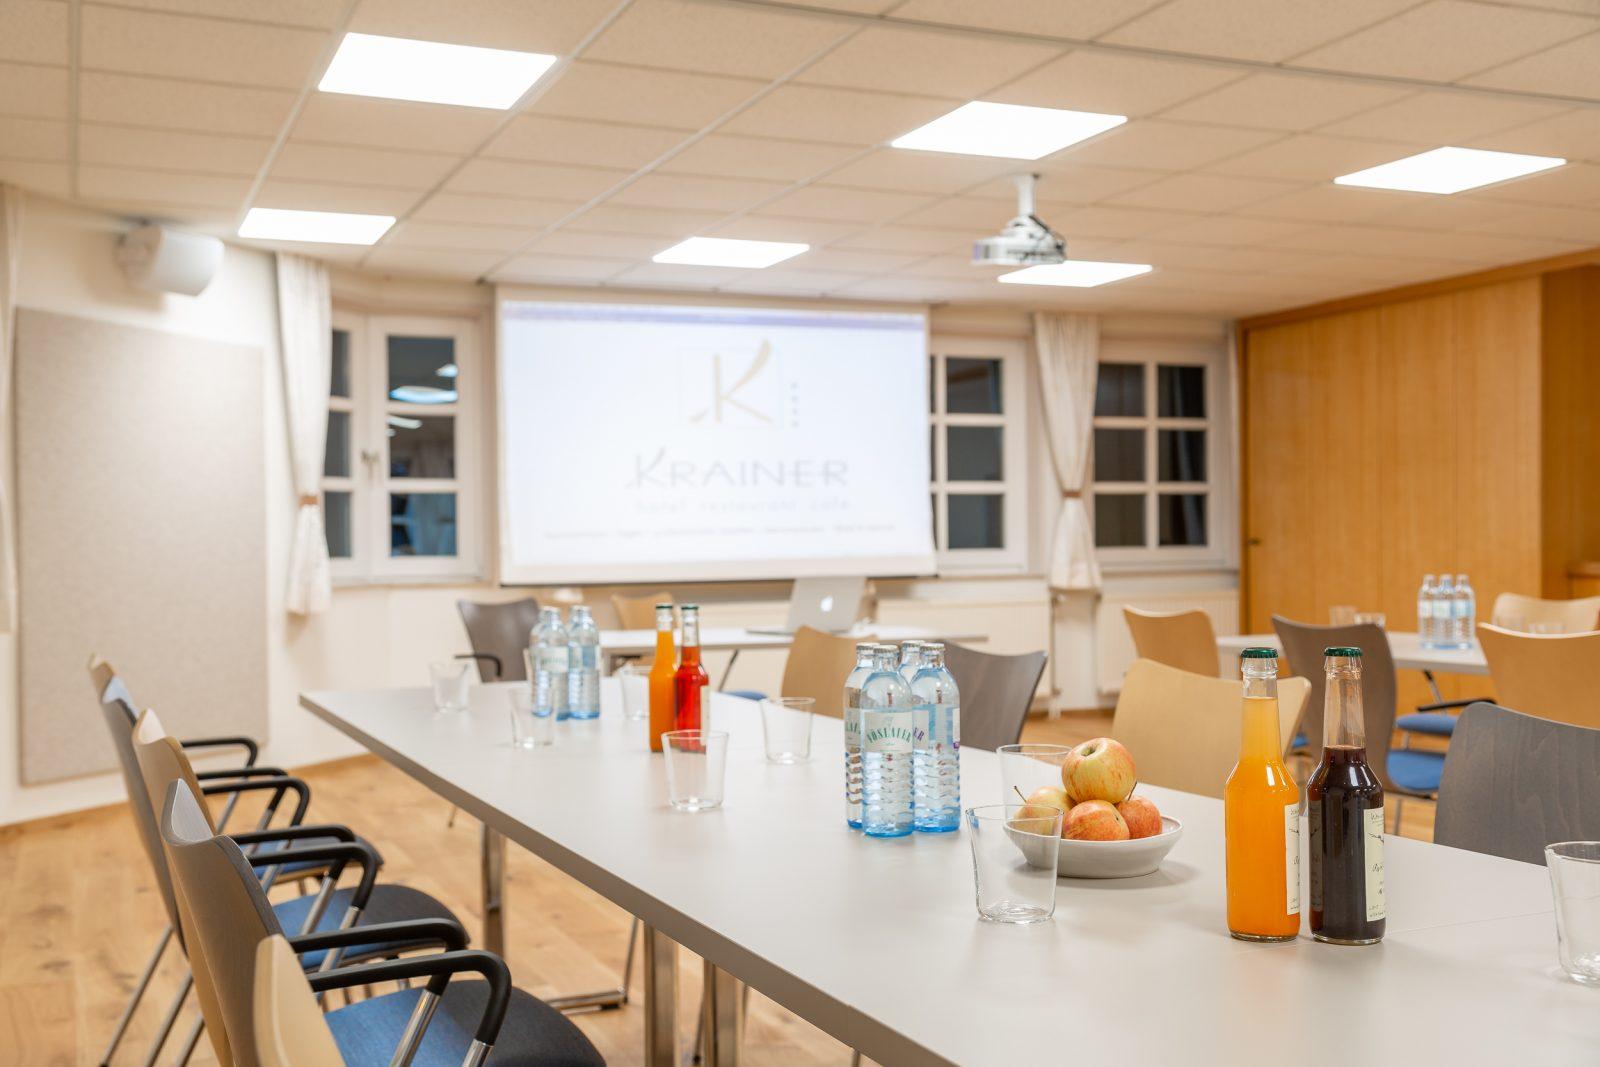 Krainer Seminarraum